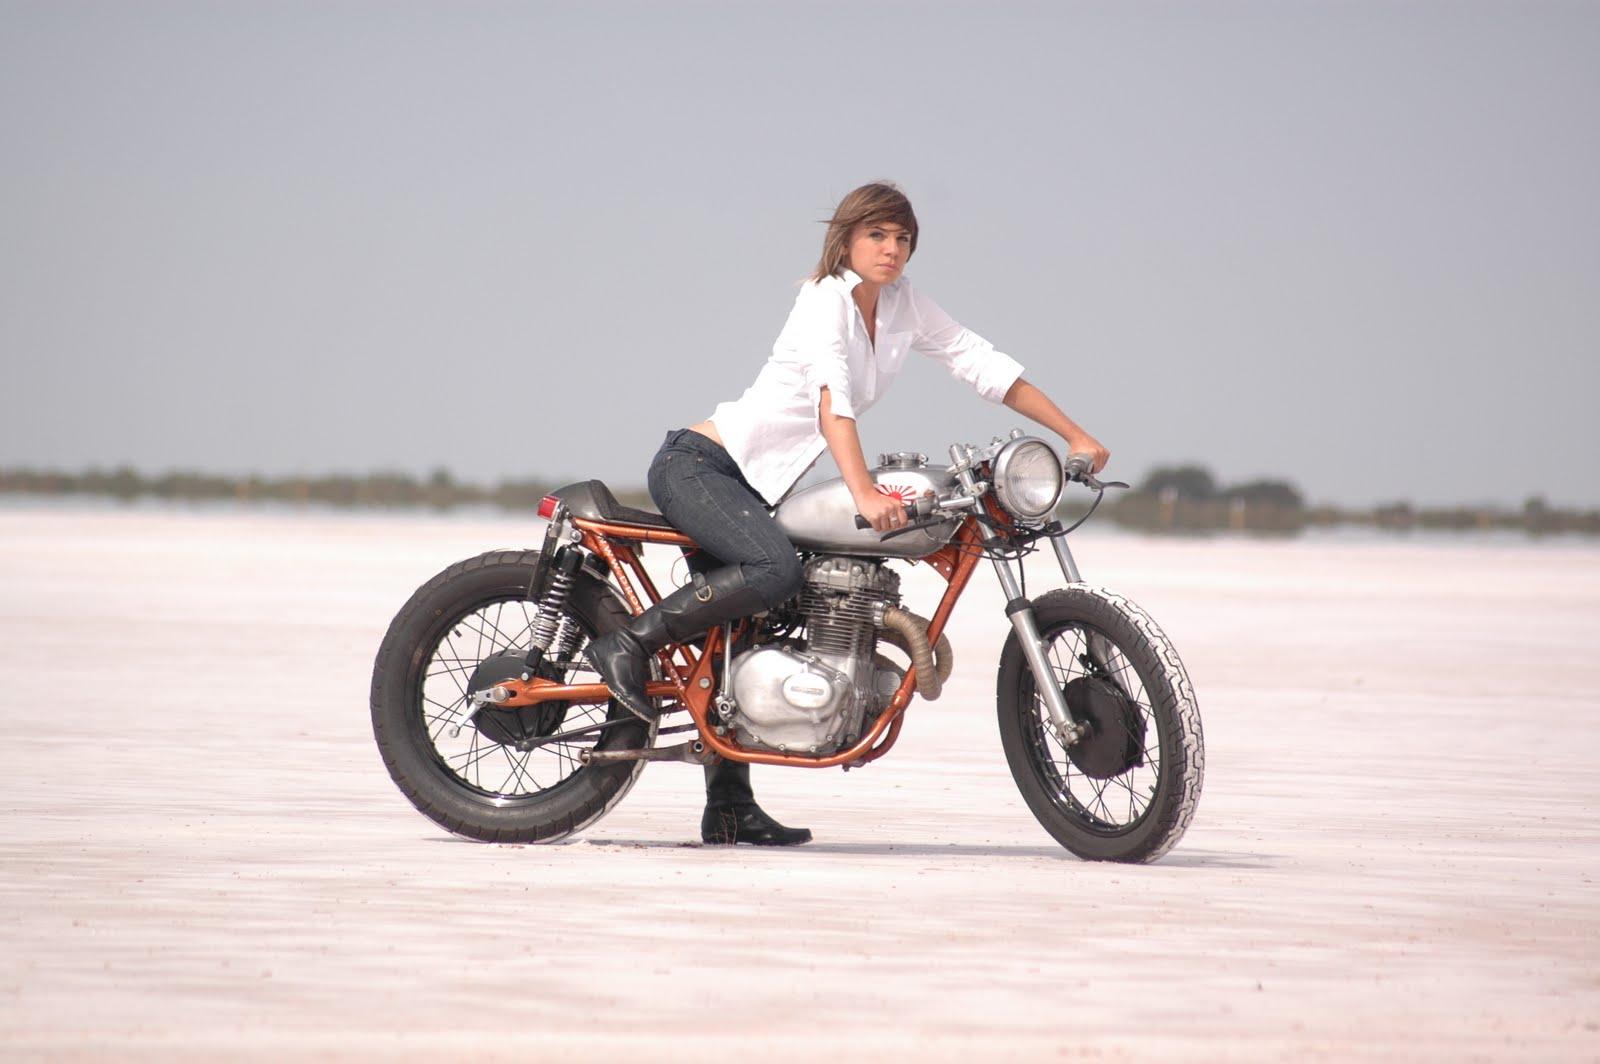 Motorcycle girl desert nude boob teens